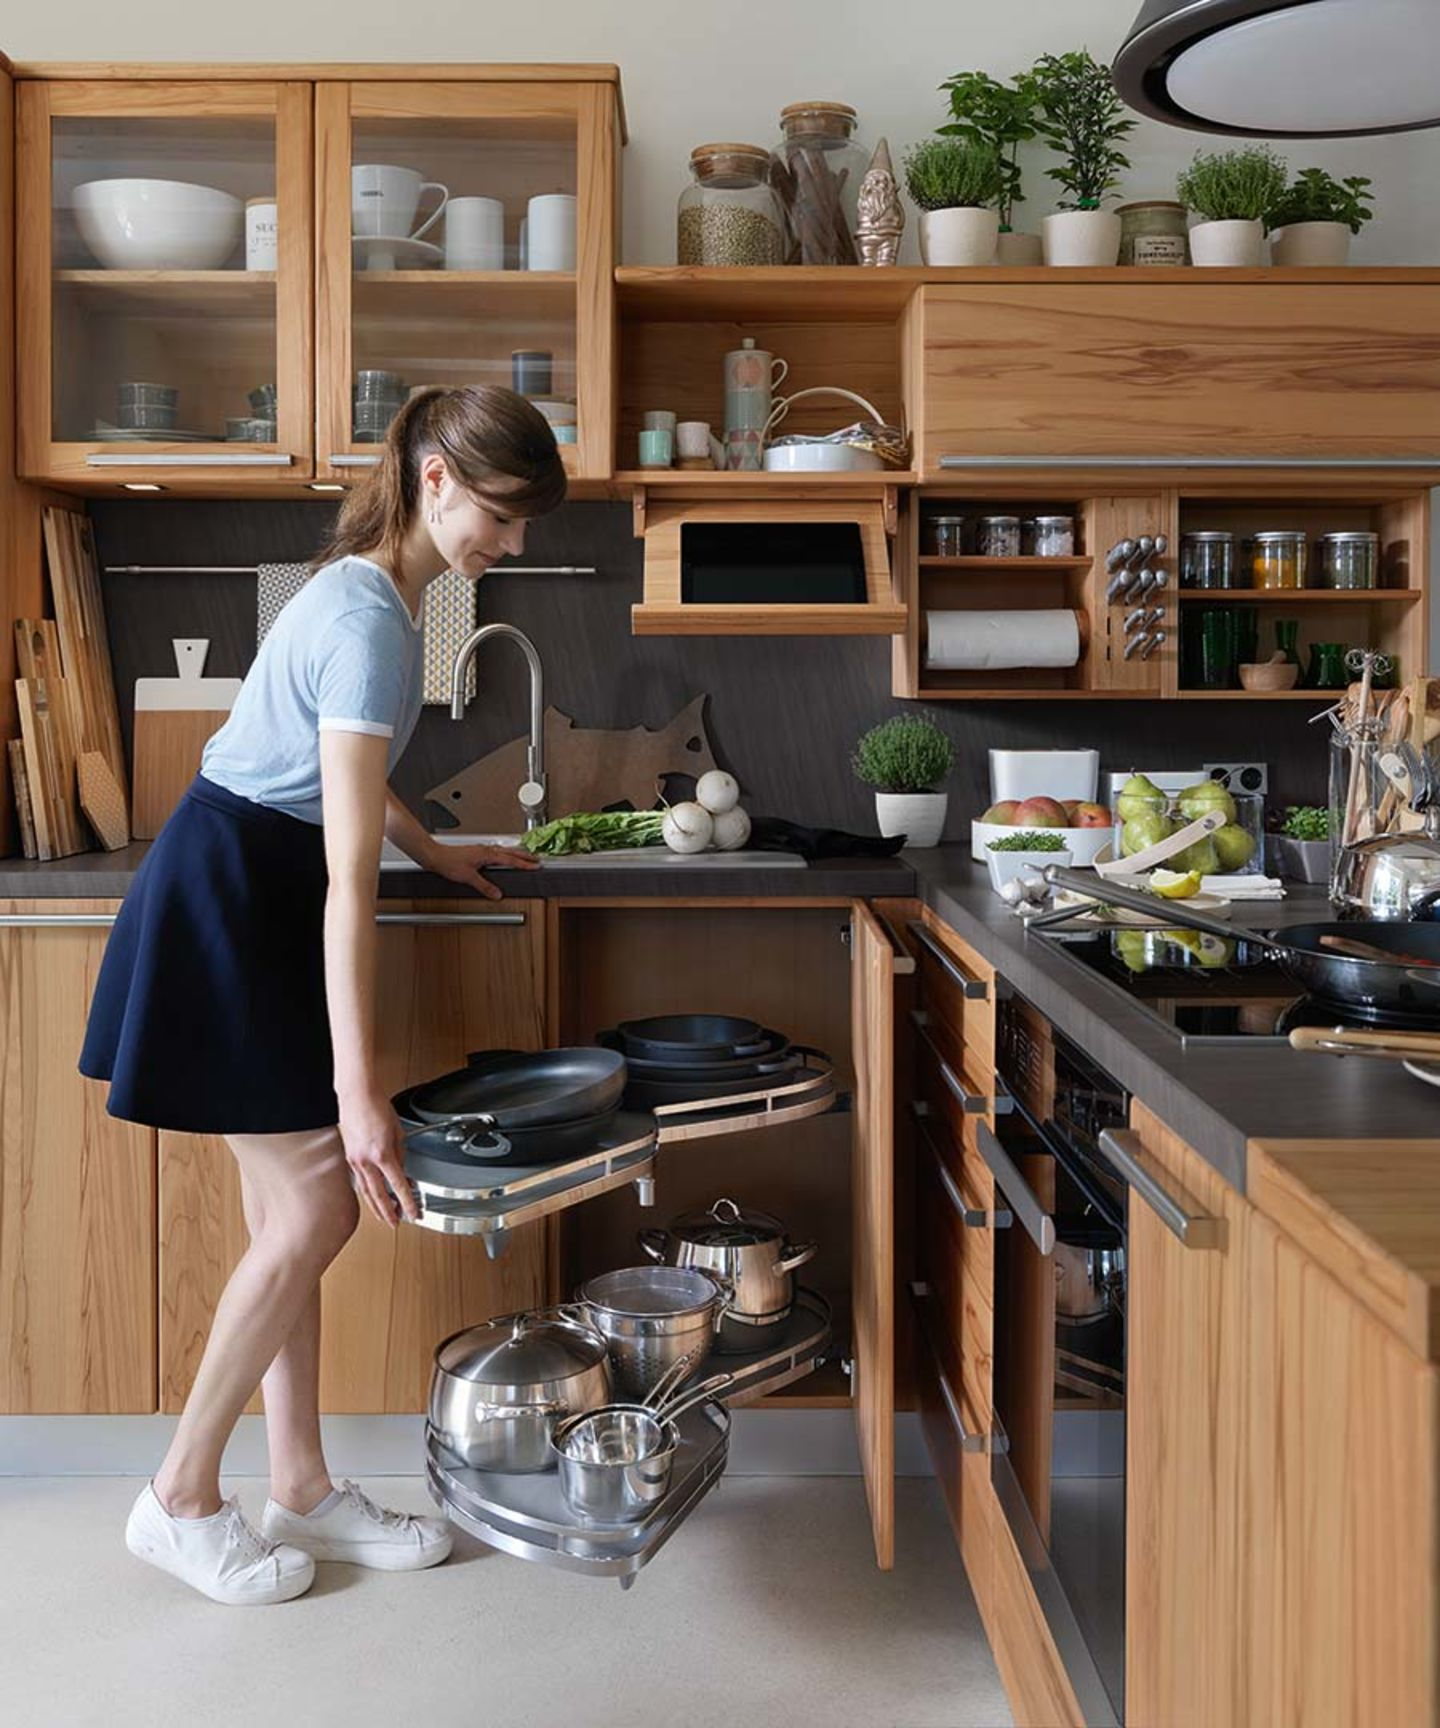 Full Size of Eckschrank Küche Nobilia Eckschrank Küche 60x60 Eckschrank Küche Auszug Ikea Eckschrank Küche Küche Eckschrank Küche